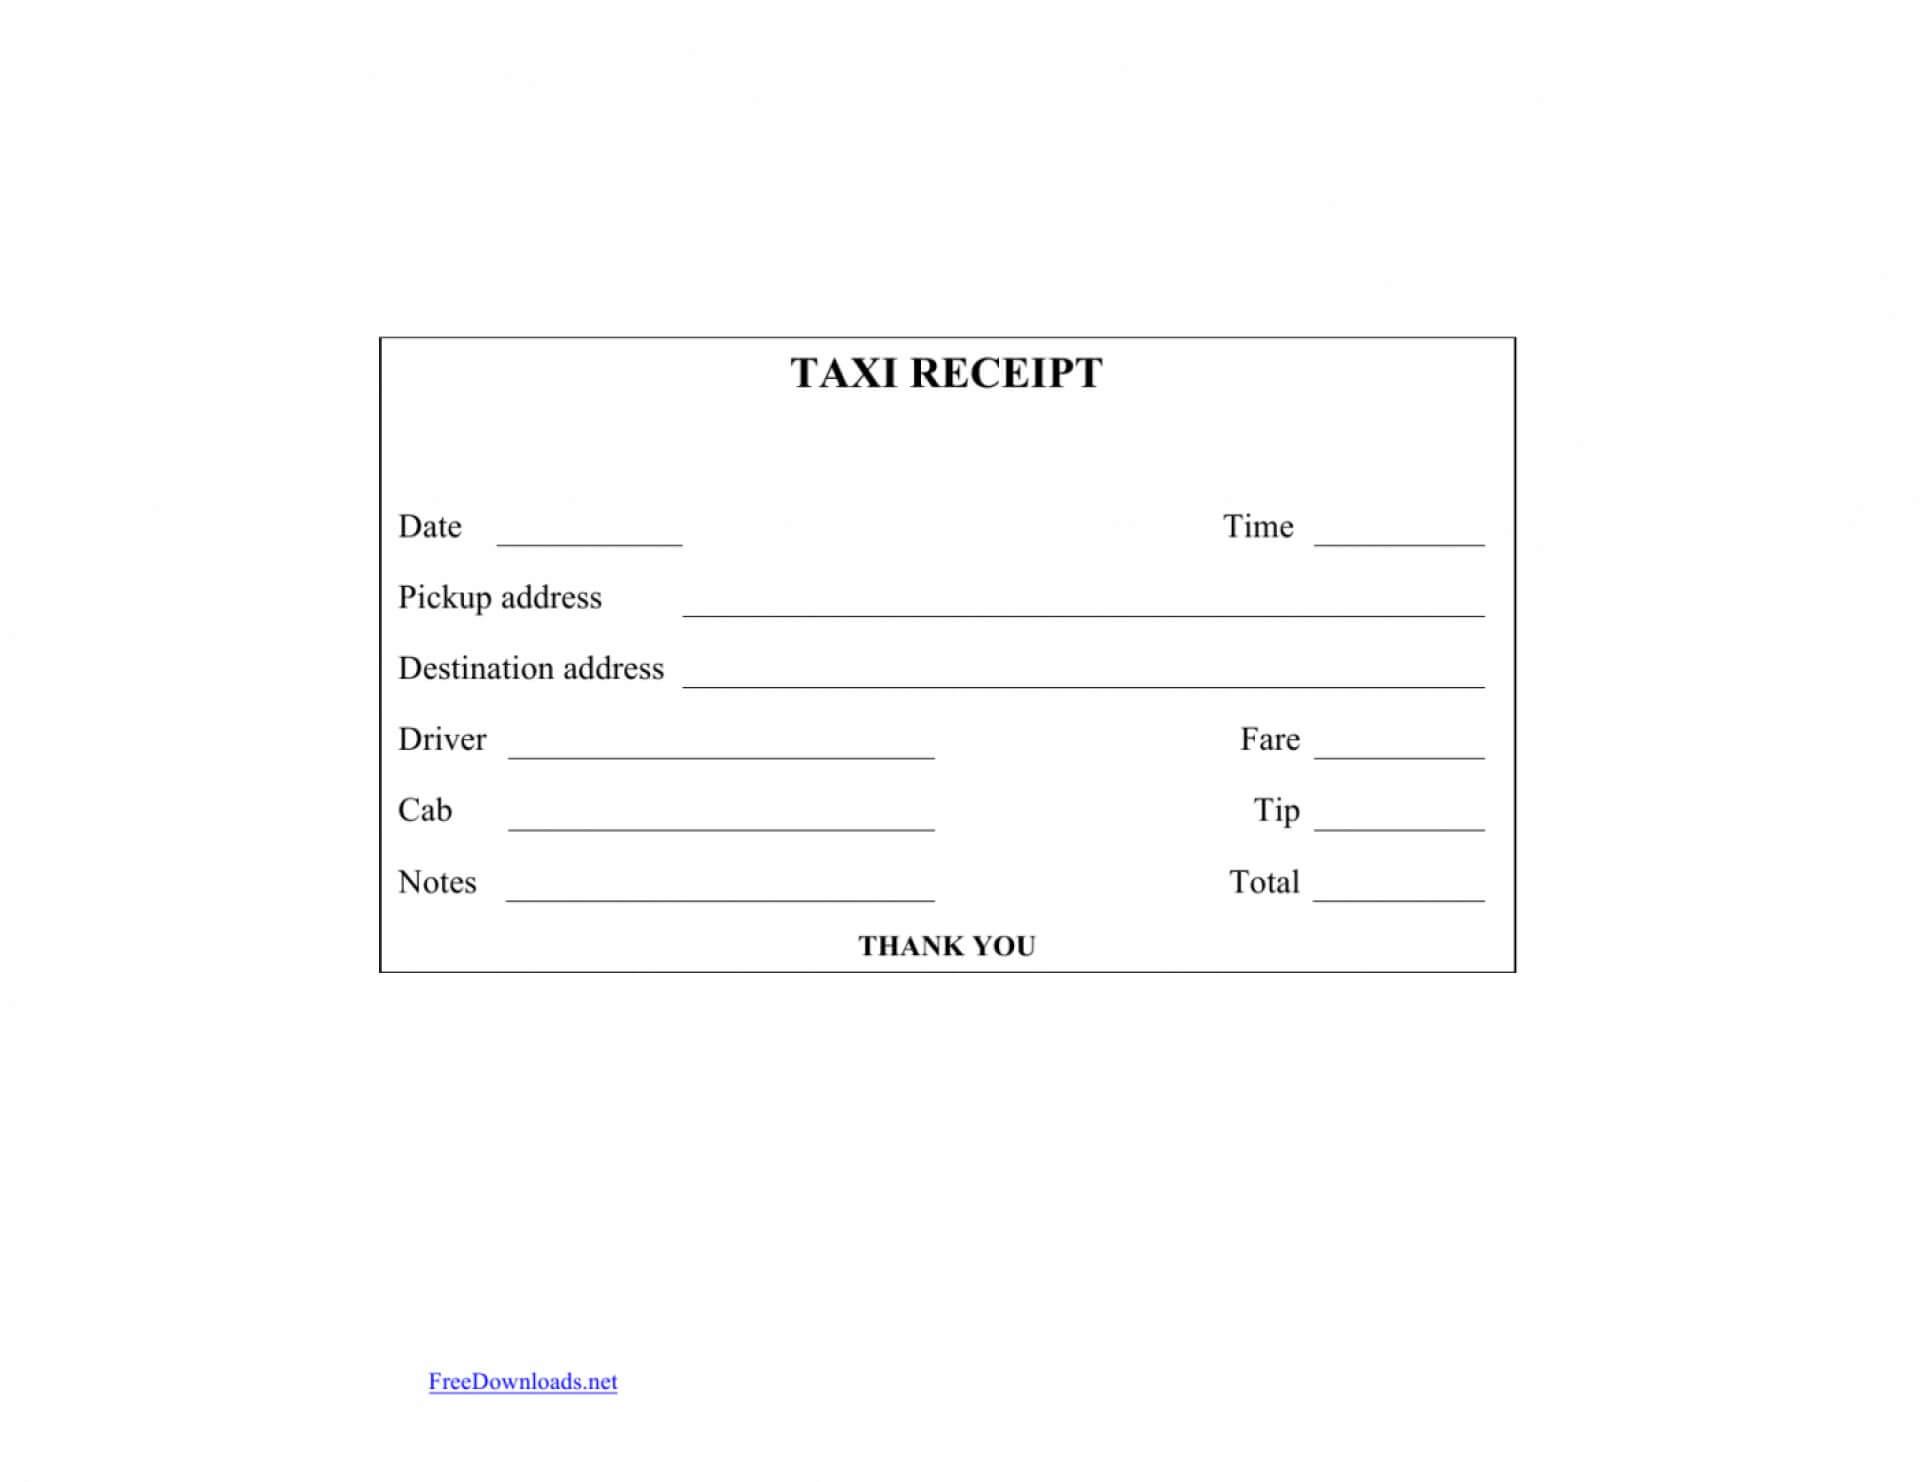 036 Blank Receipt Template Pdf Printablek Forms Sheets Cash Inside Blank Taxi Receipt Template